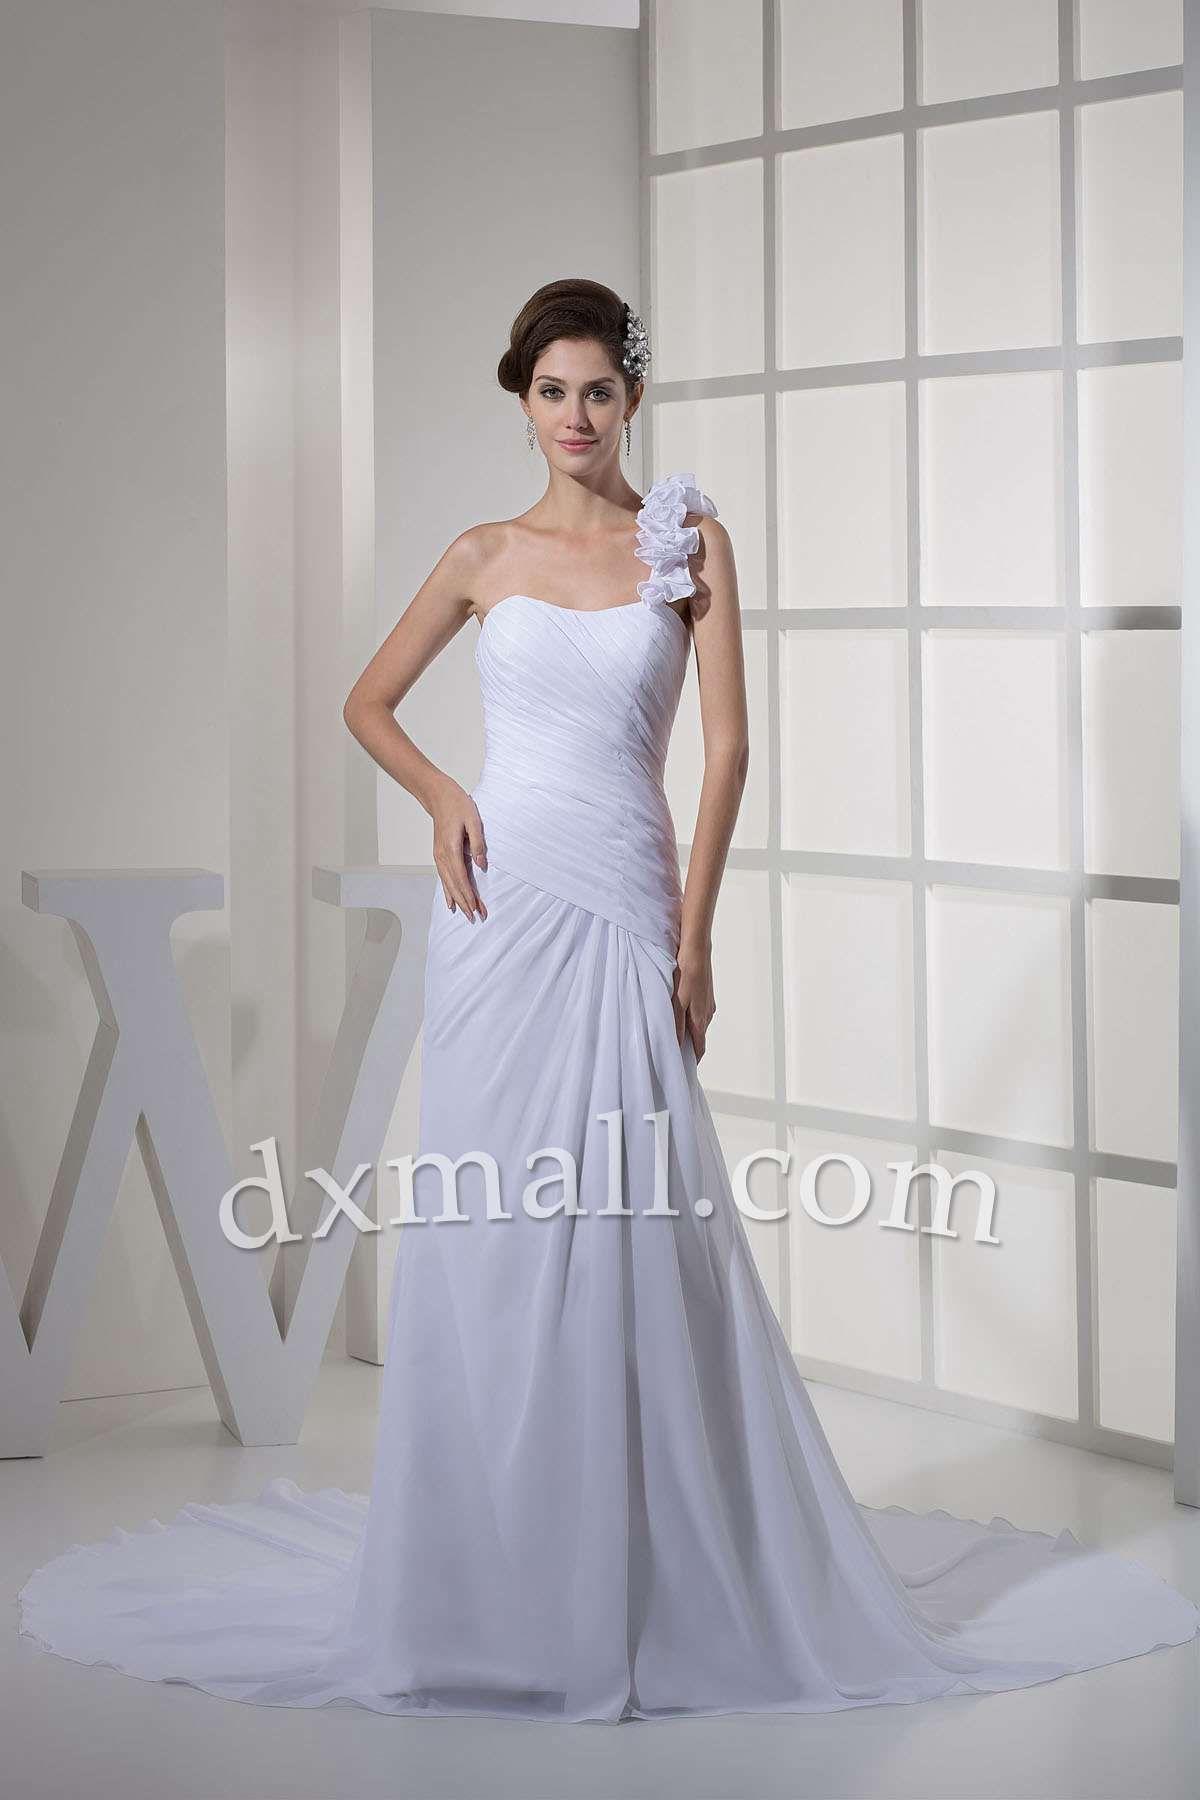 Simple and cheap wedding dresses  Drop Waist Wedding Dresses One Shoulder Court Train Chiffon Satin